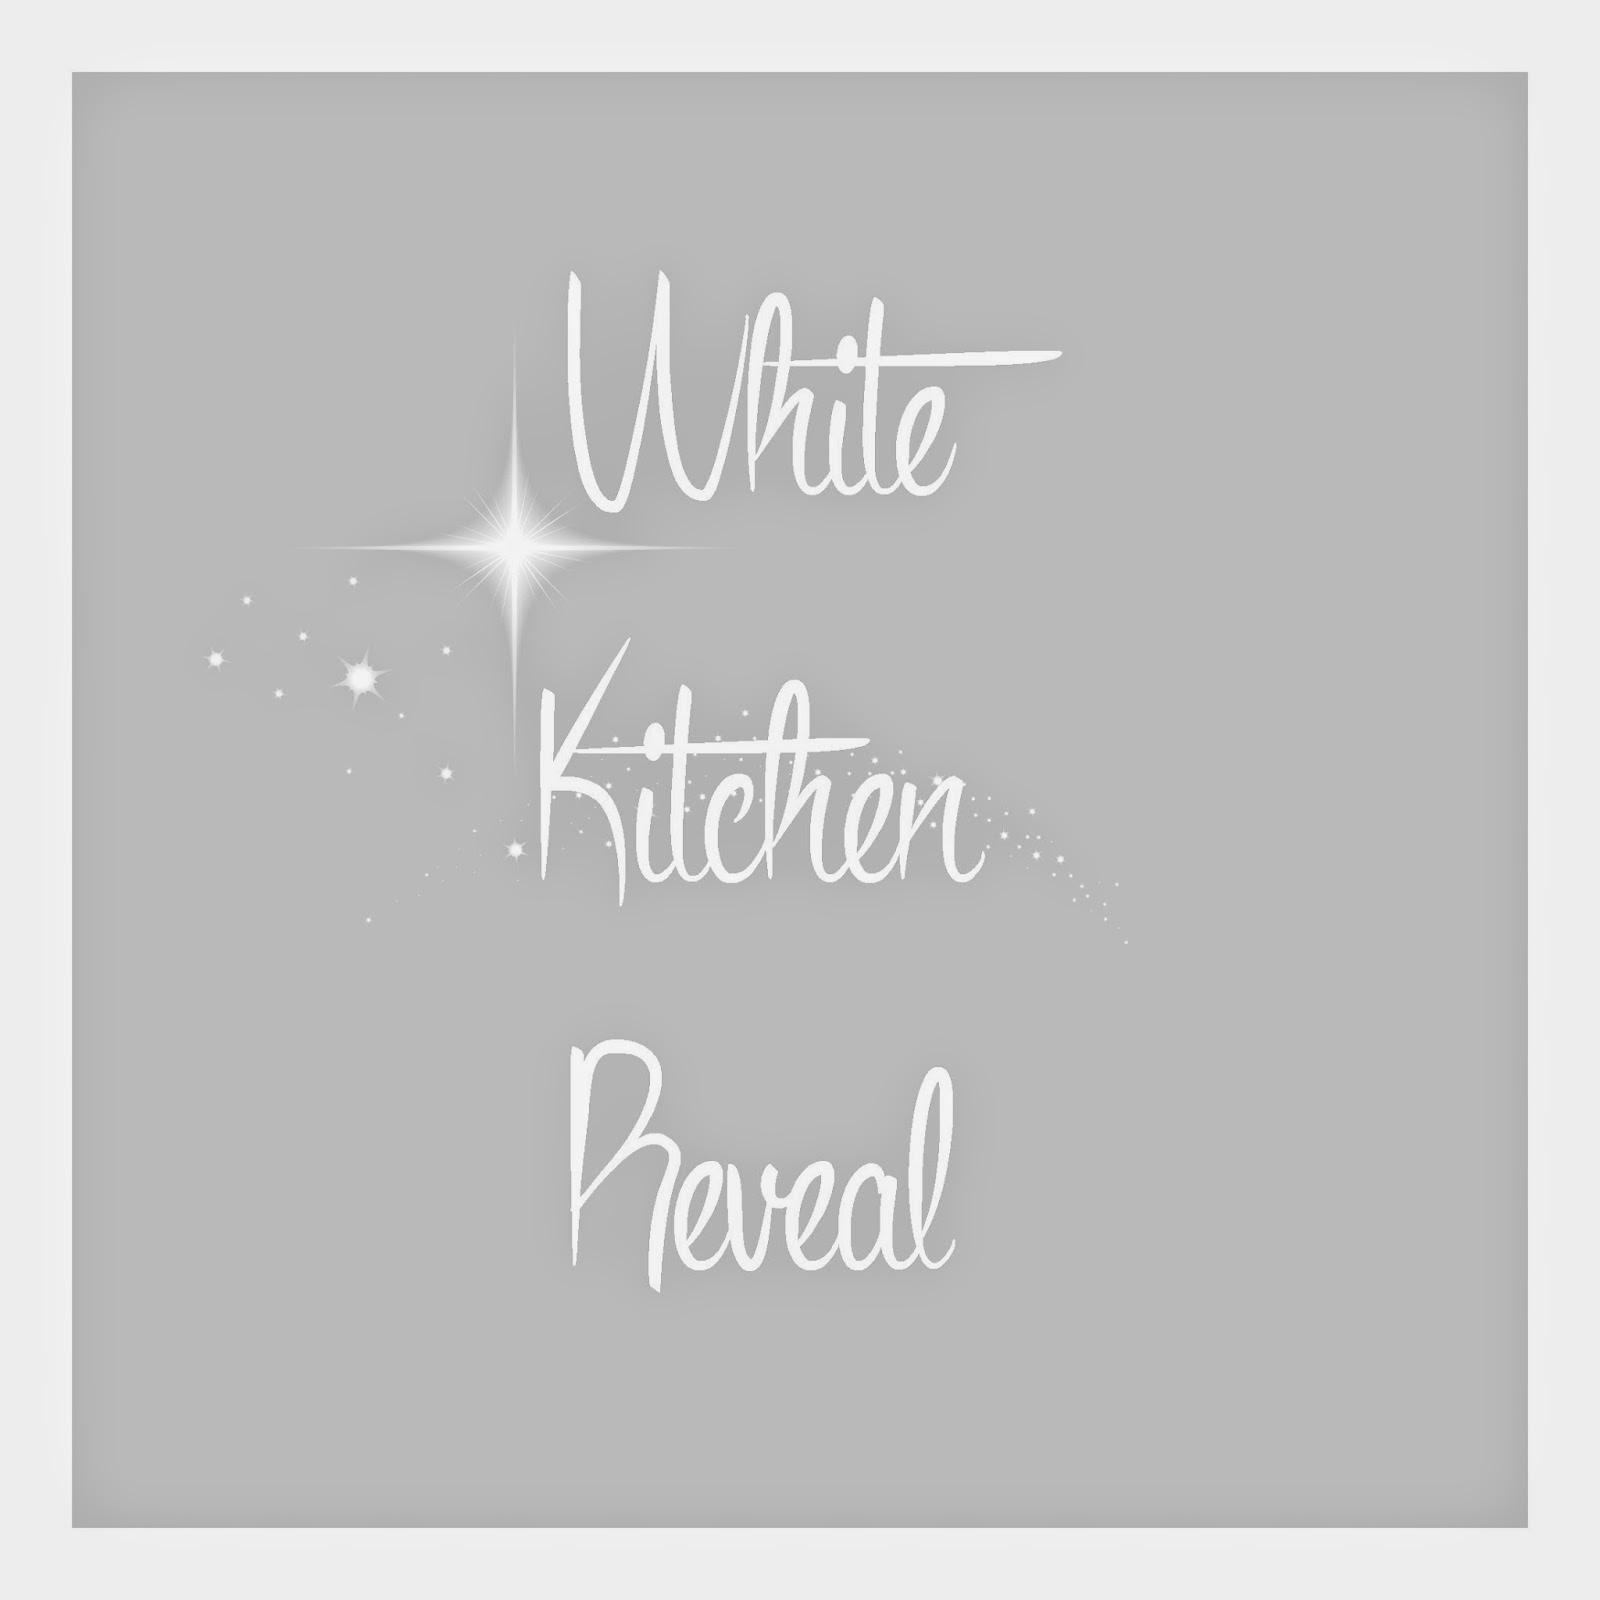 http://northshorebungalow.blogspot.com/2014/08/white-kitchen-reveal.html